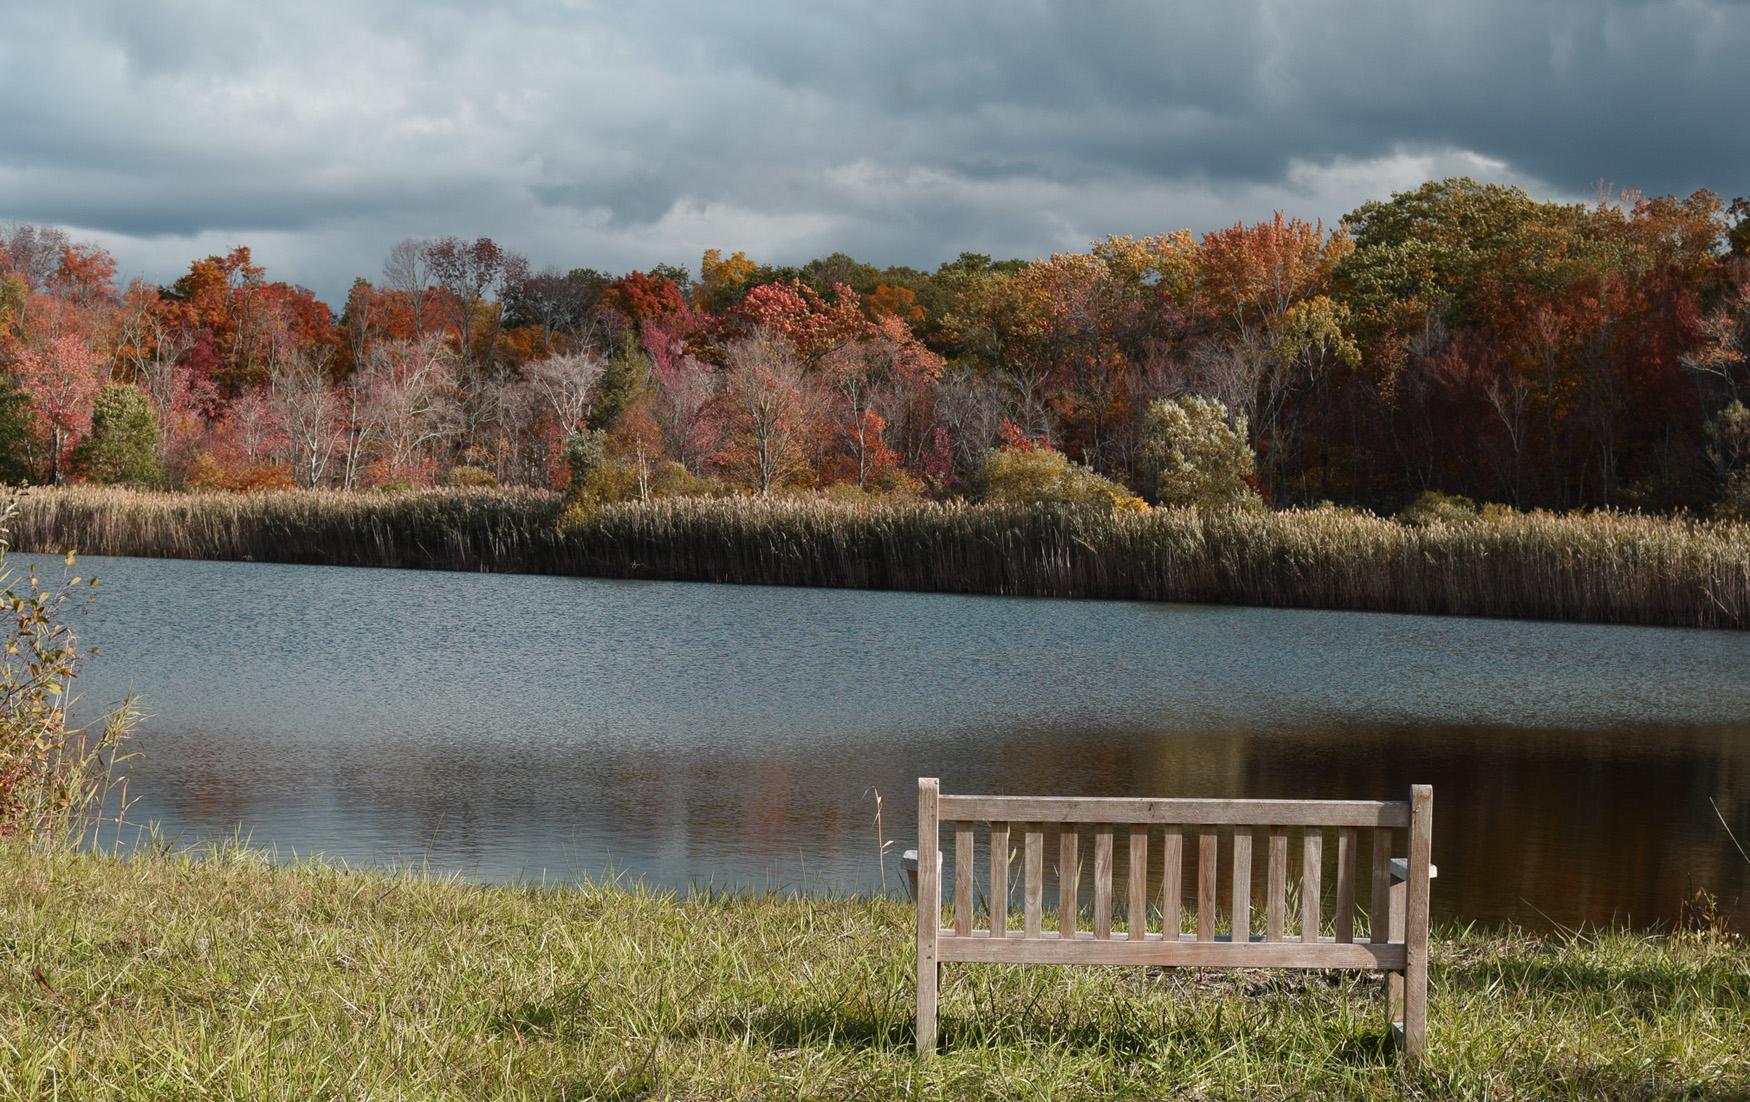 Property For Sale at Lakeville Pond Property